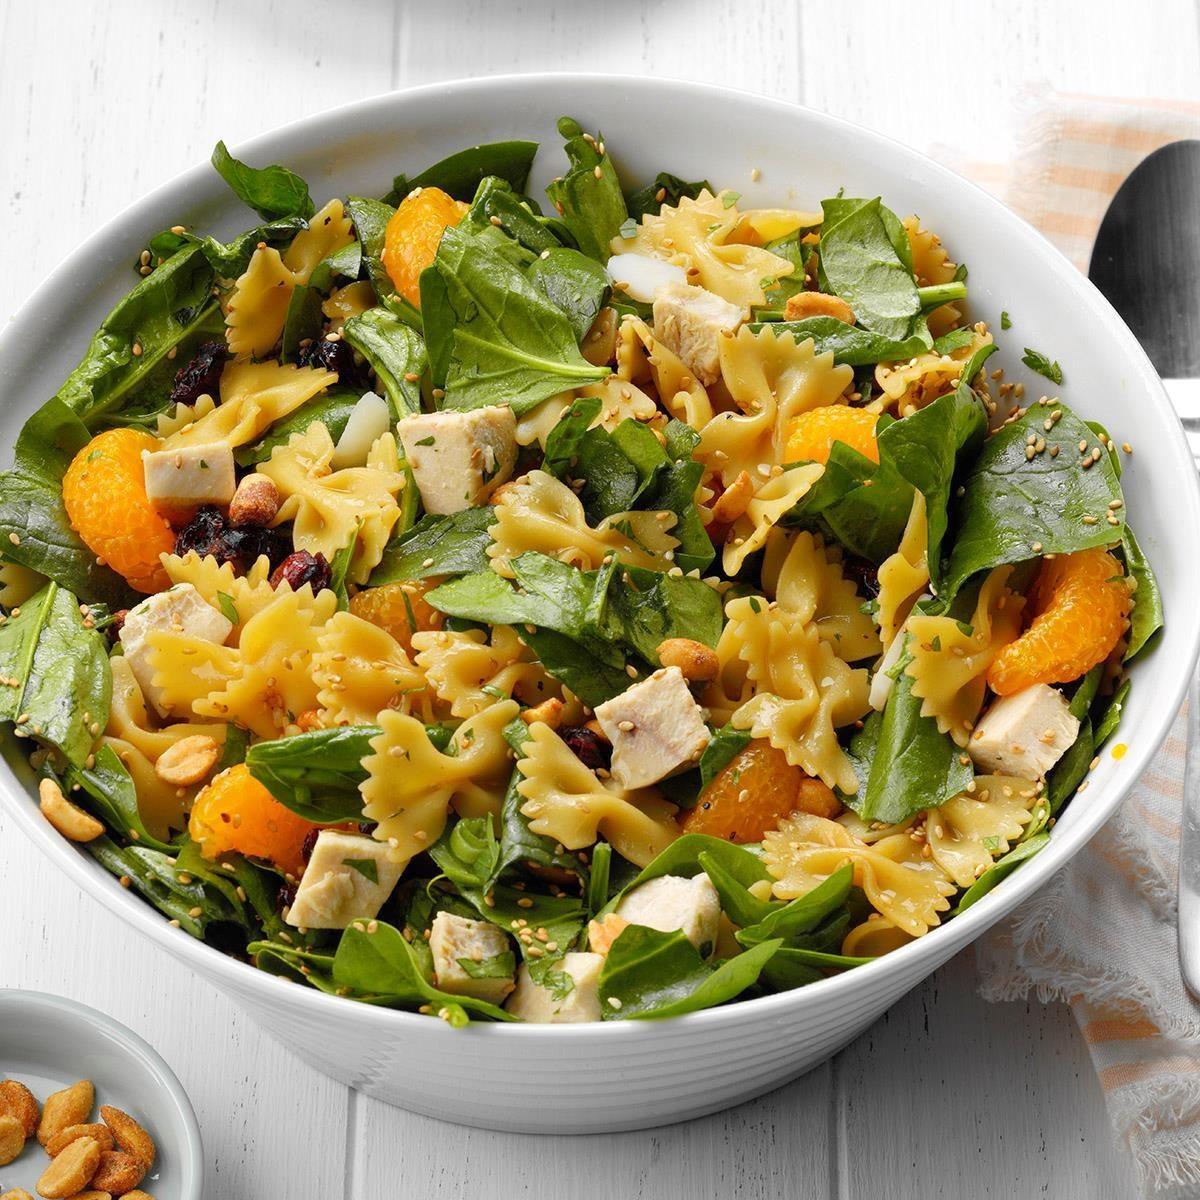 Utah: Special Sesame Chicken Salad